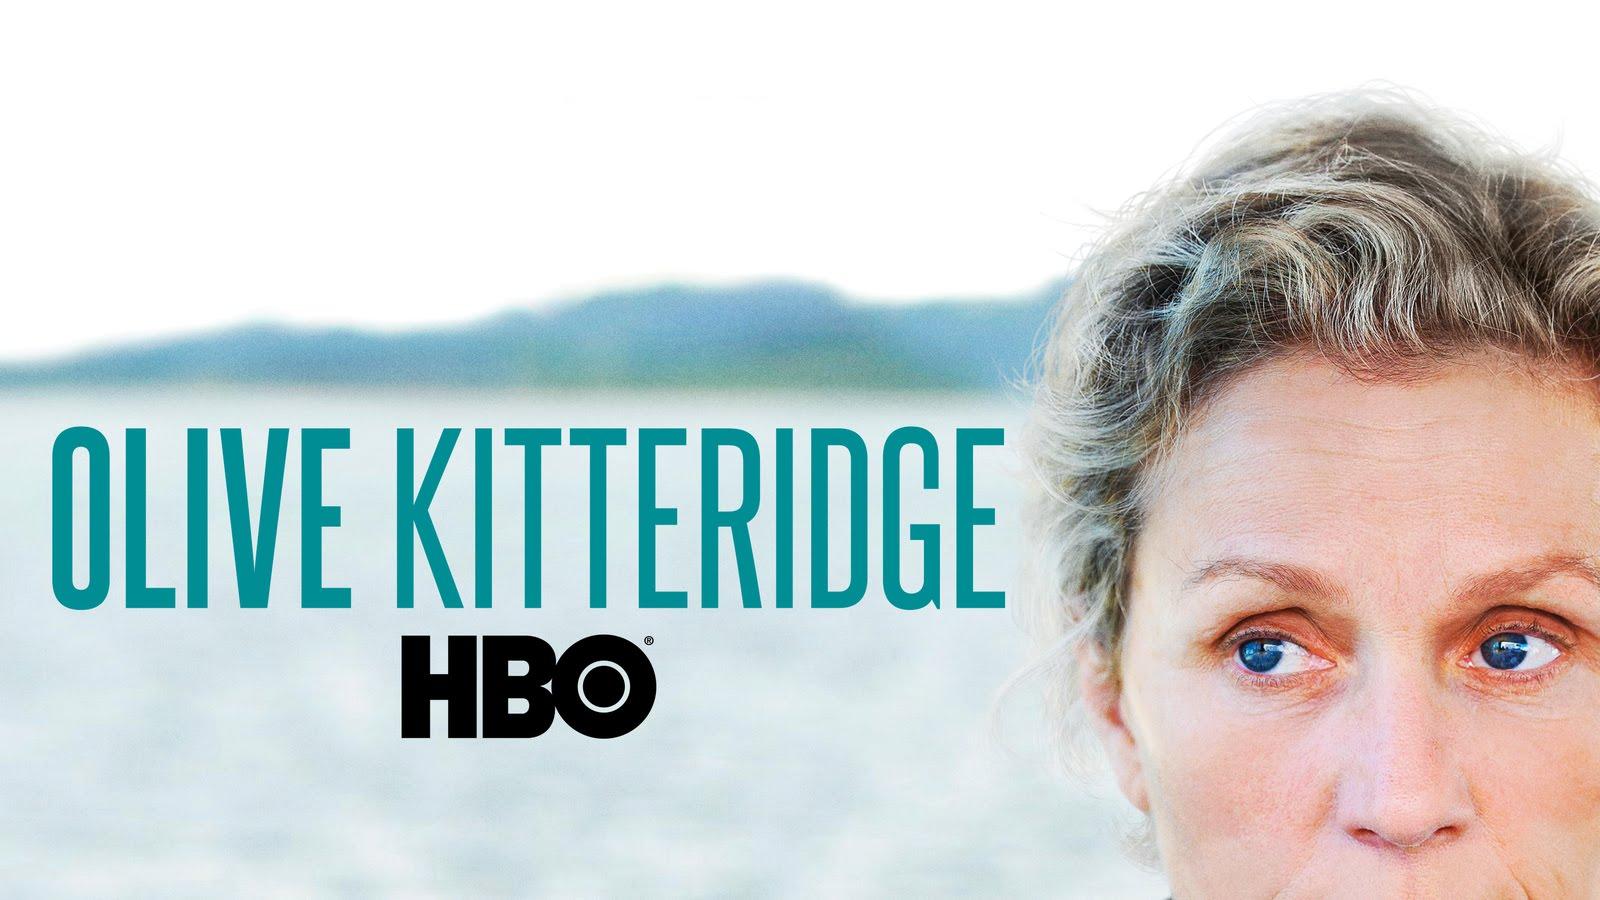 OLIVE KITTERIDGE (winner: Outstanding Lead Actor, Outstanding Miniseries)